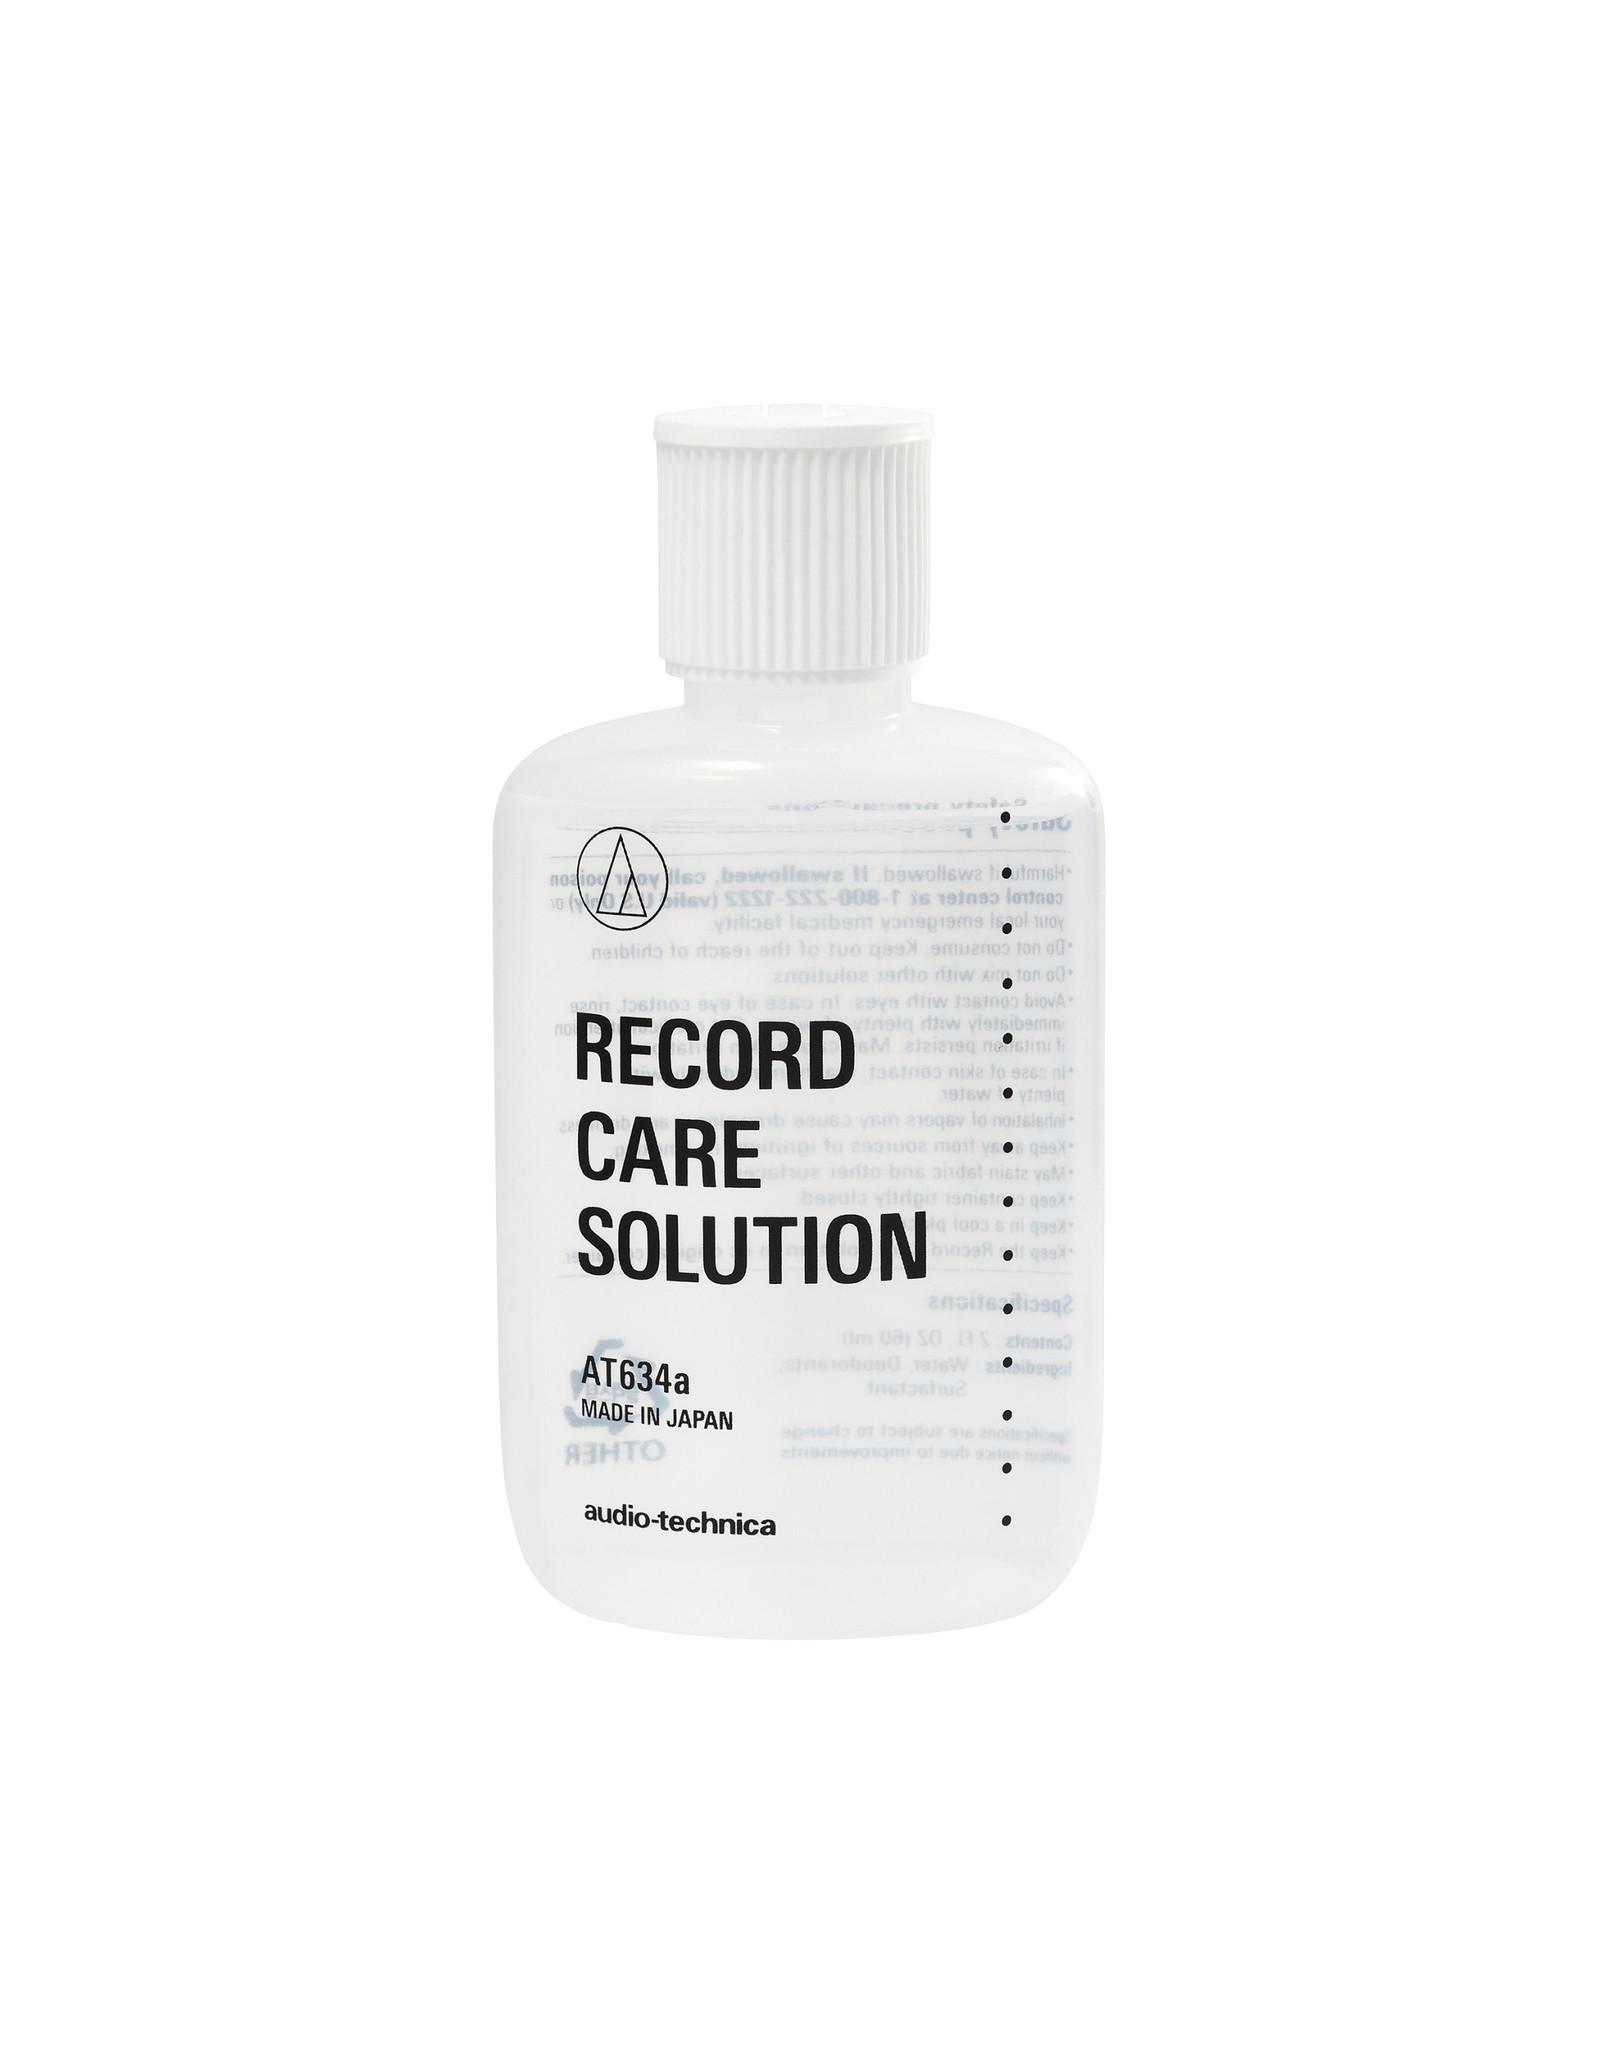 Audio-Technica Audio-Technica / Record Cleaning Kit